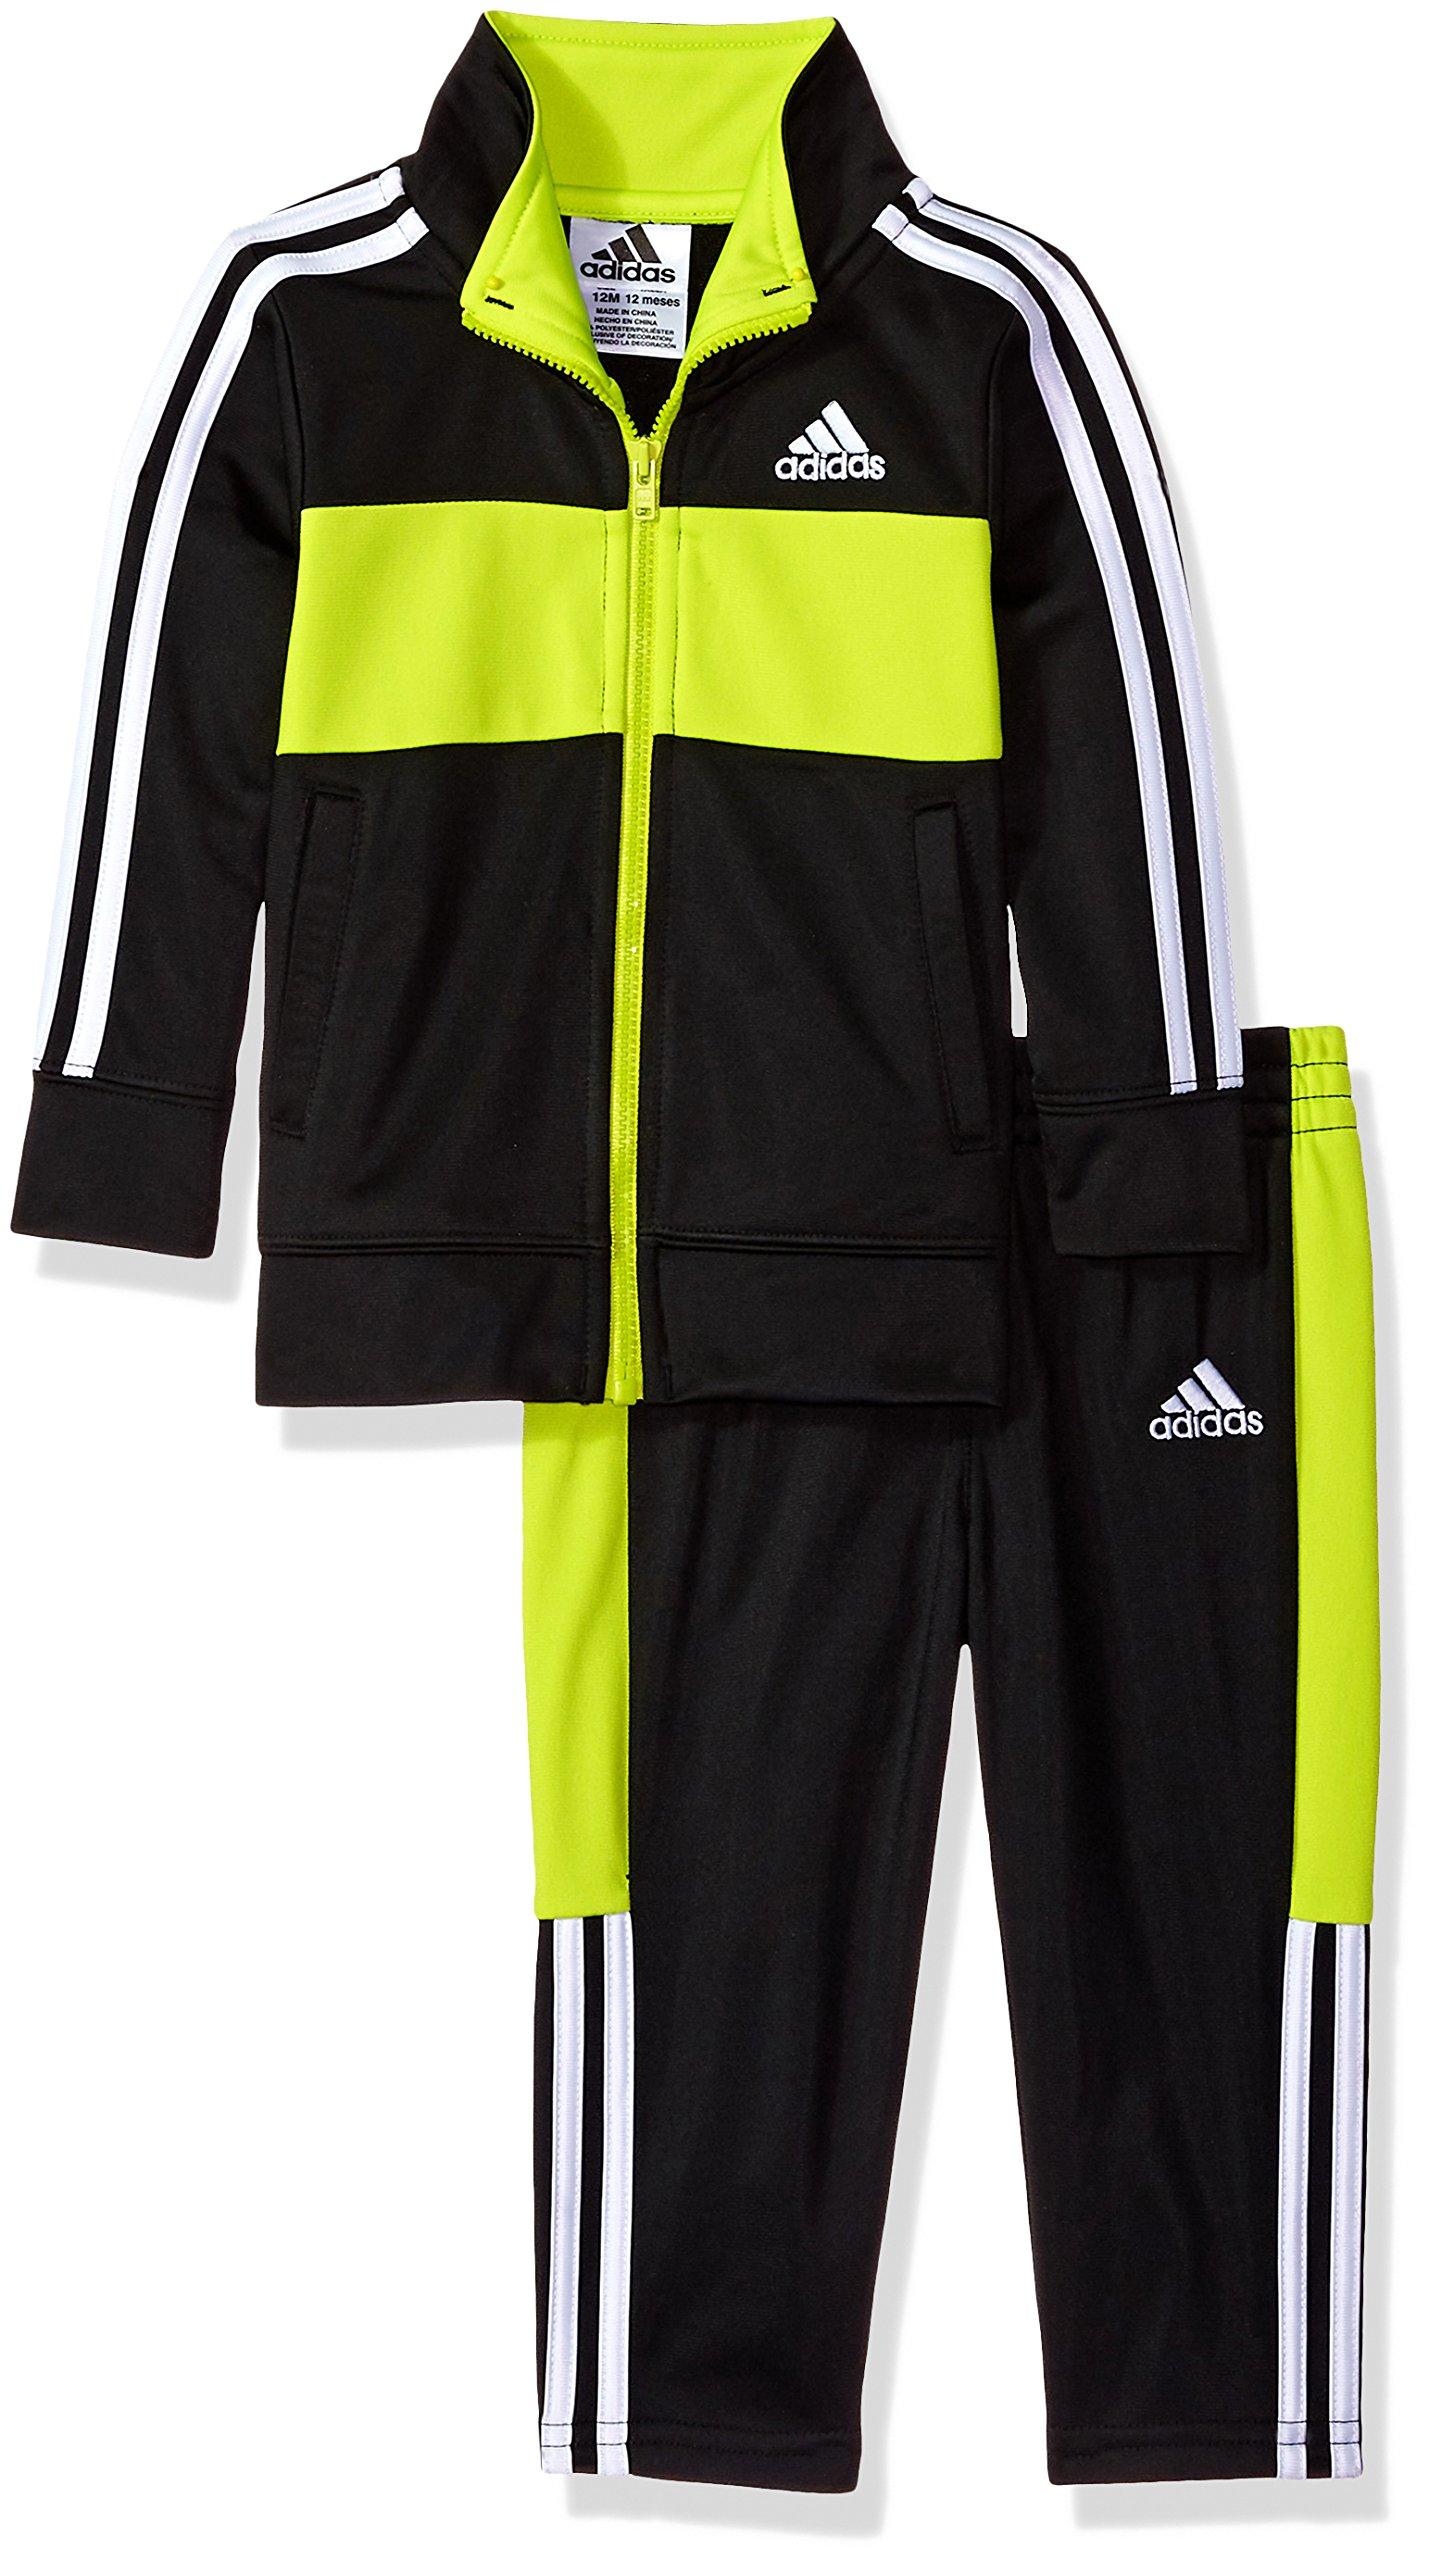 6da65a7a9 Galleon - Adidas Baby Boys Colorblock Tricot Tracksuit 2-Piece Set,  Black/Neon, 18 Months